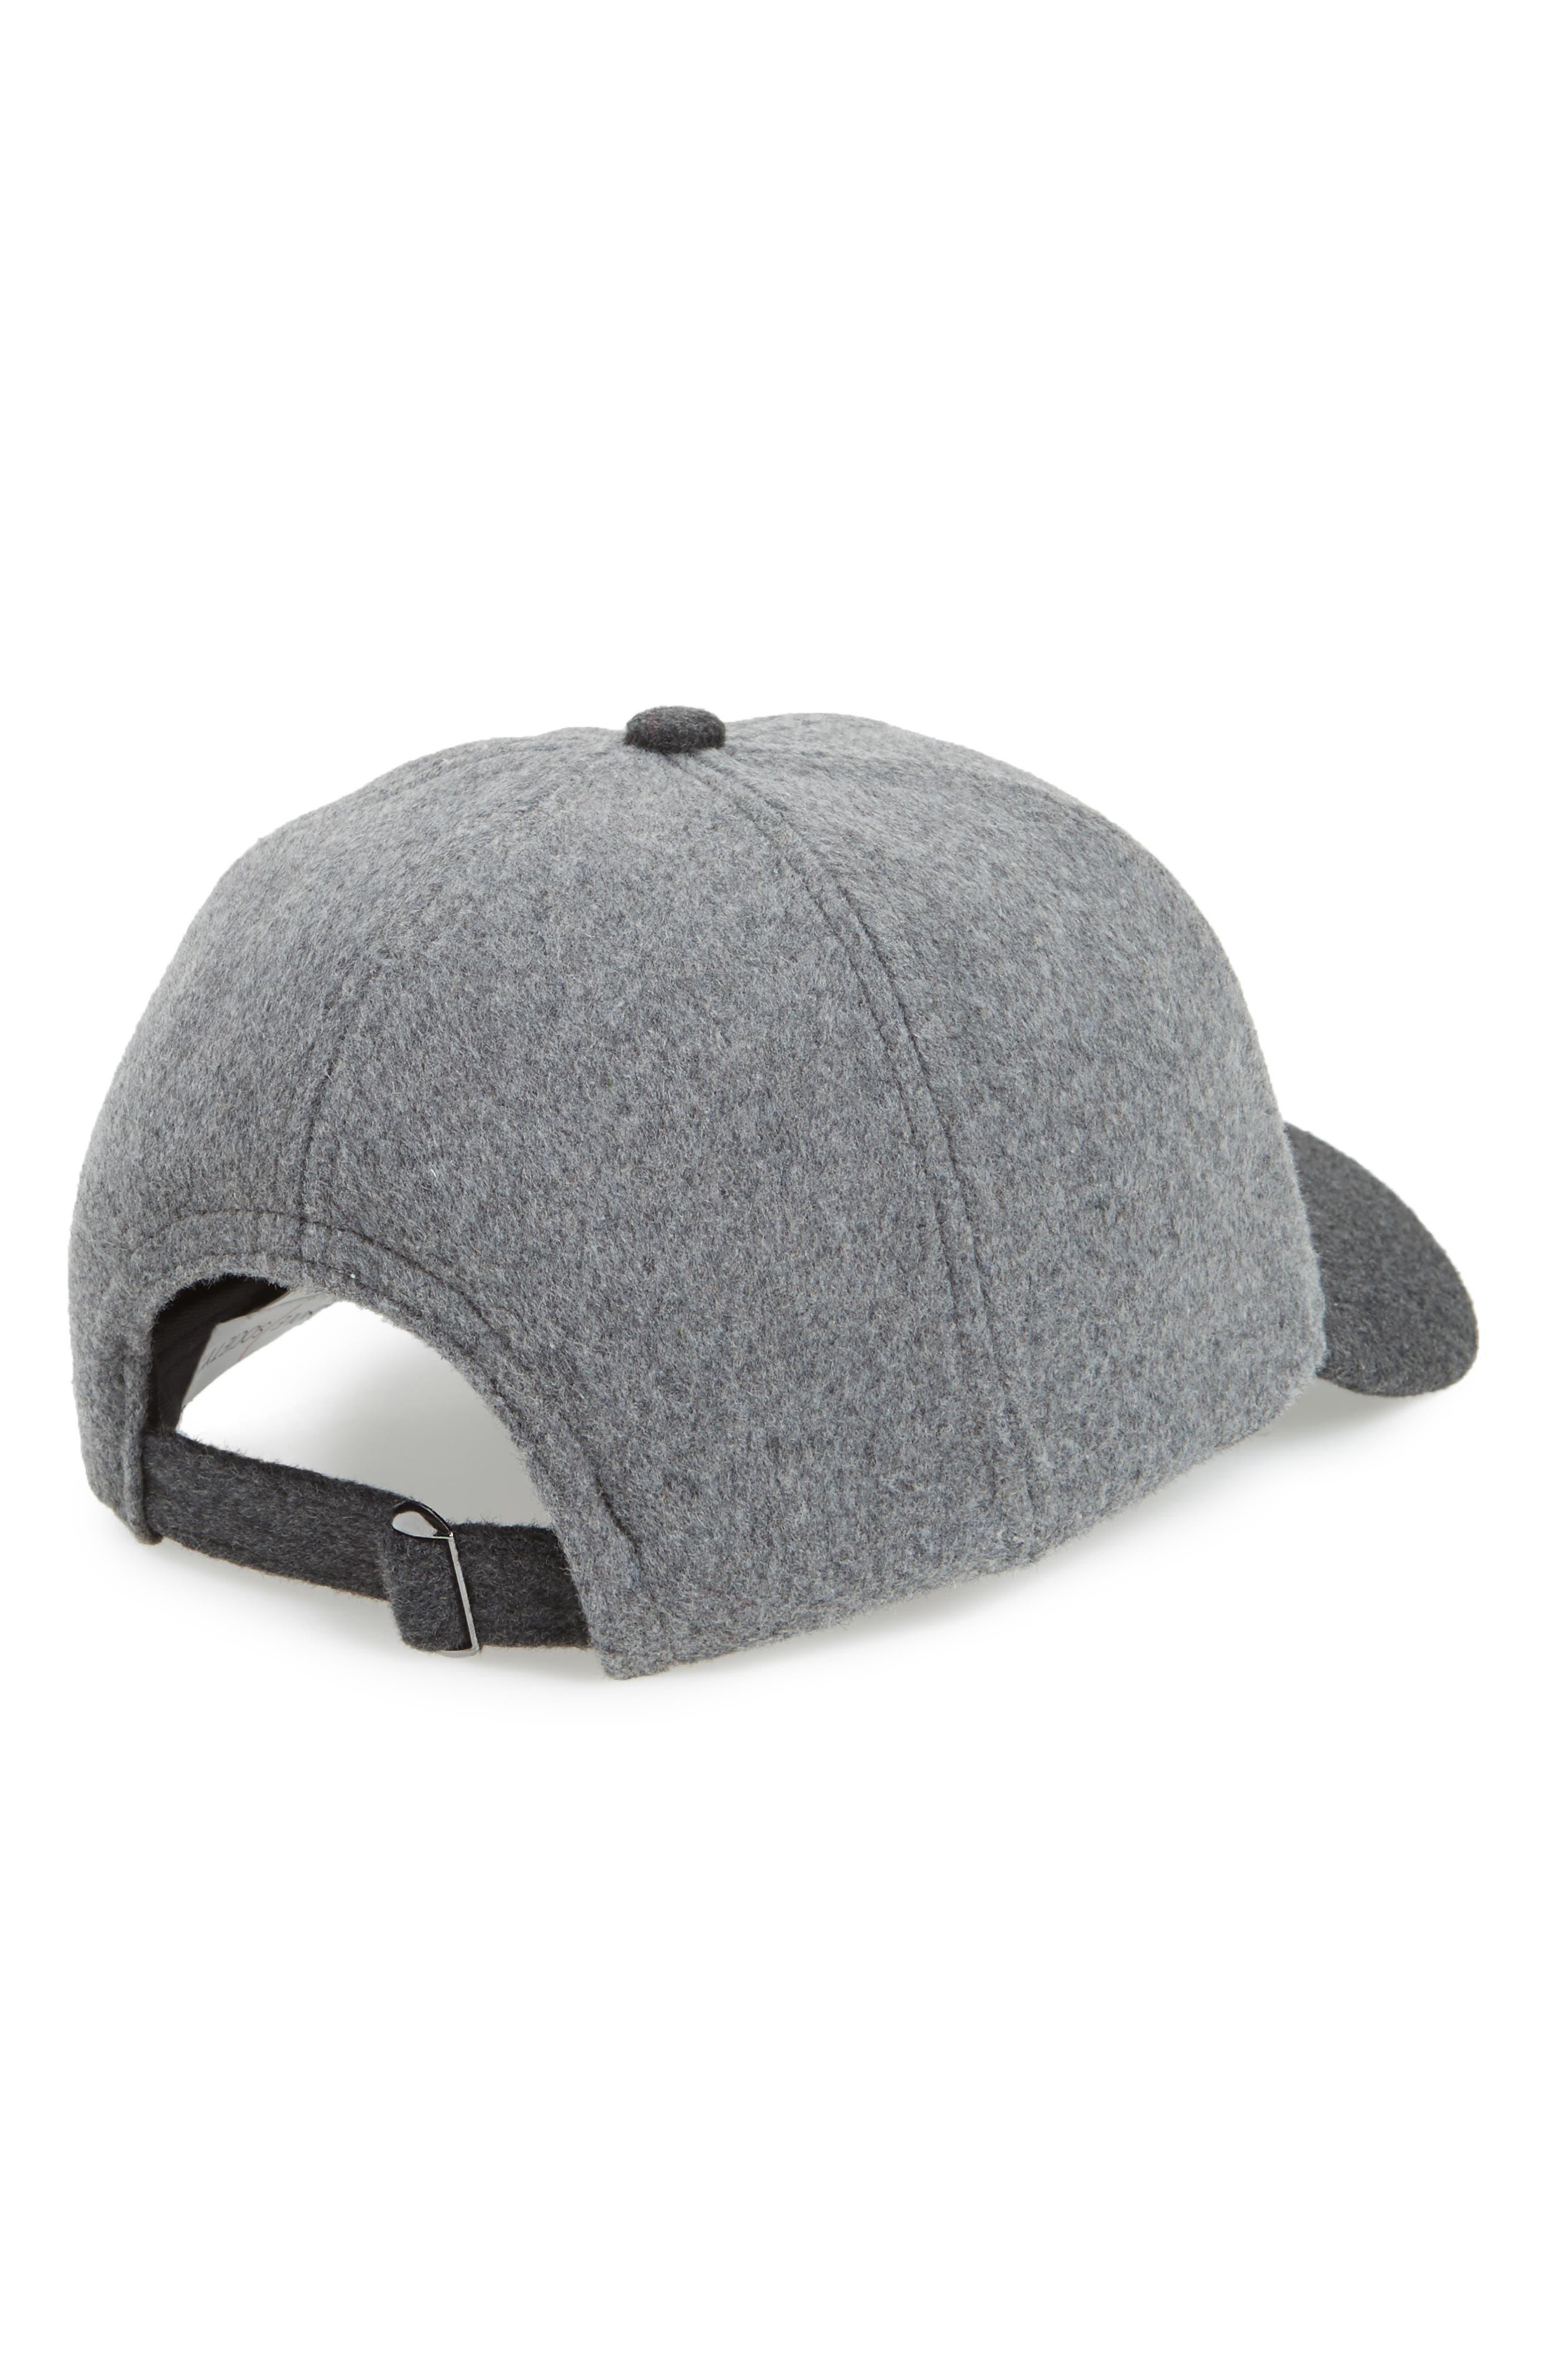 Two-Tone Baseball Cap,                             Alternate thumbnail 2, color,                             020